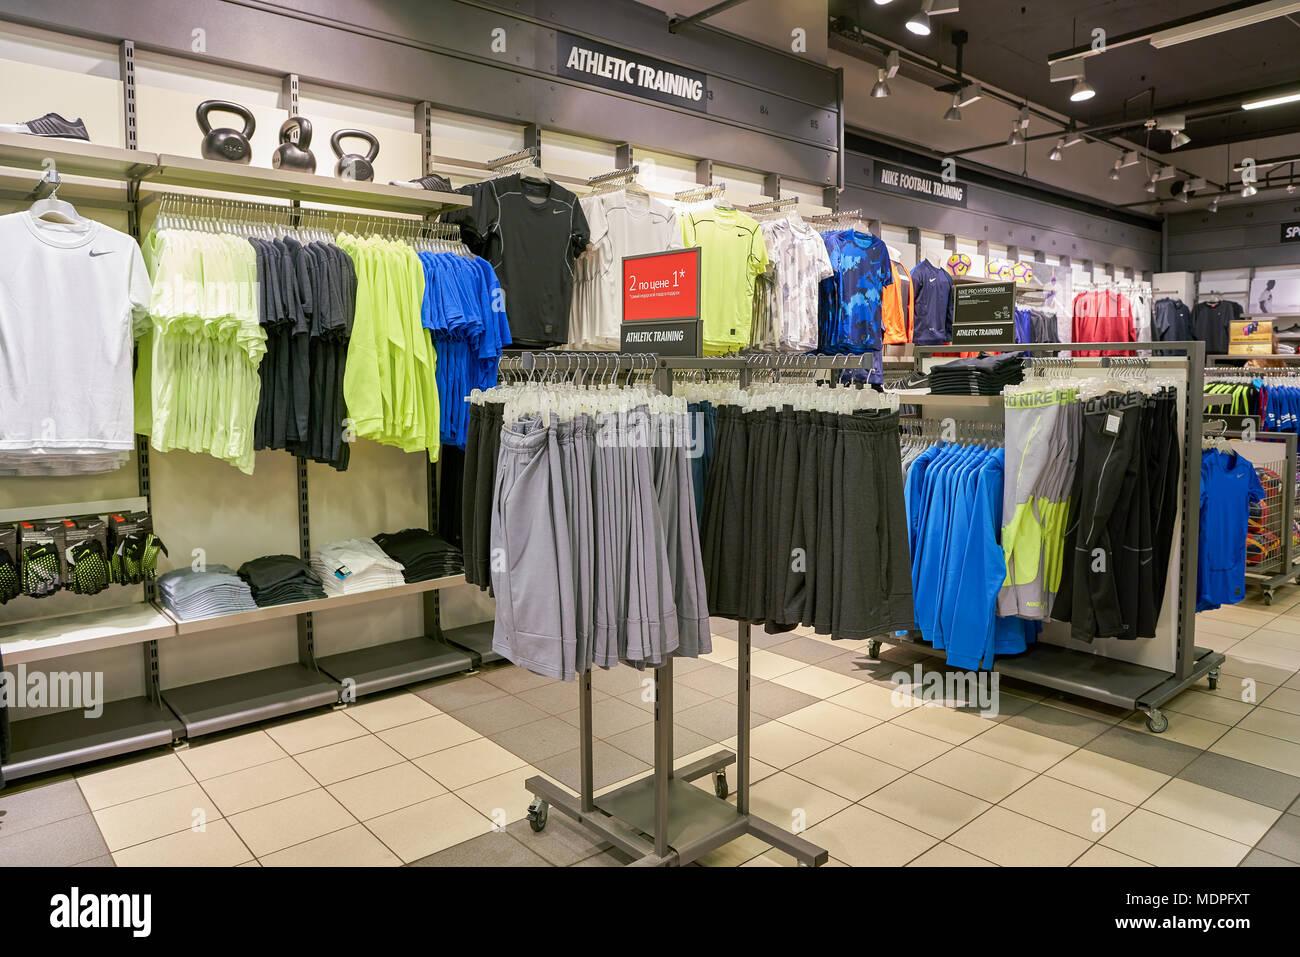 SAINT PETERSBURG, RUSSIA - CIRCA OCTOBER, 2017: inside Nike Factory Store  in Saint